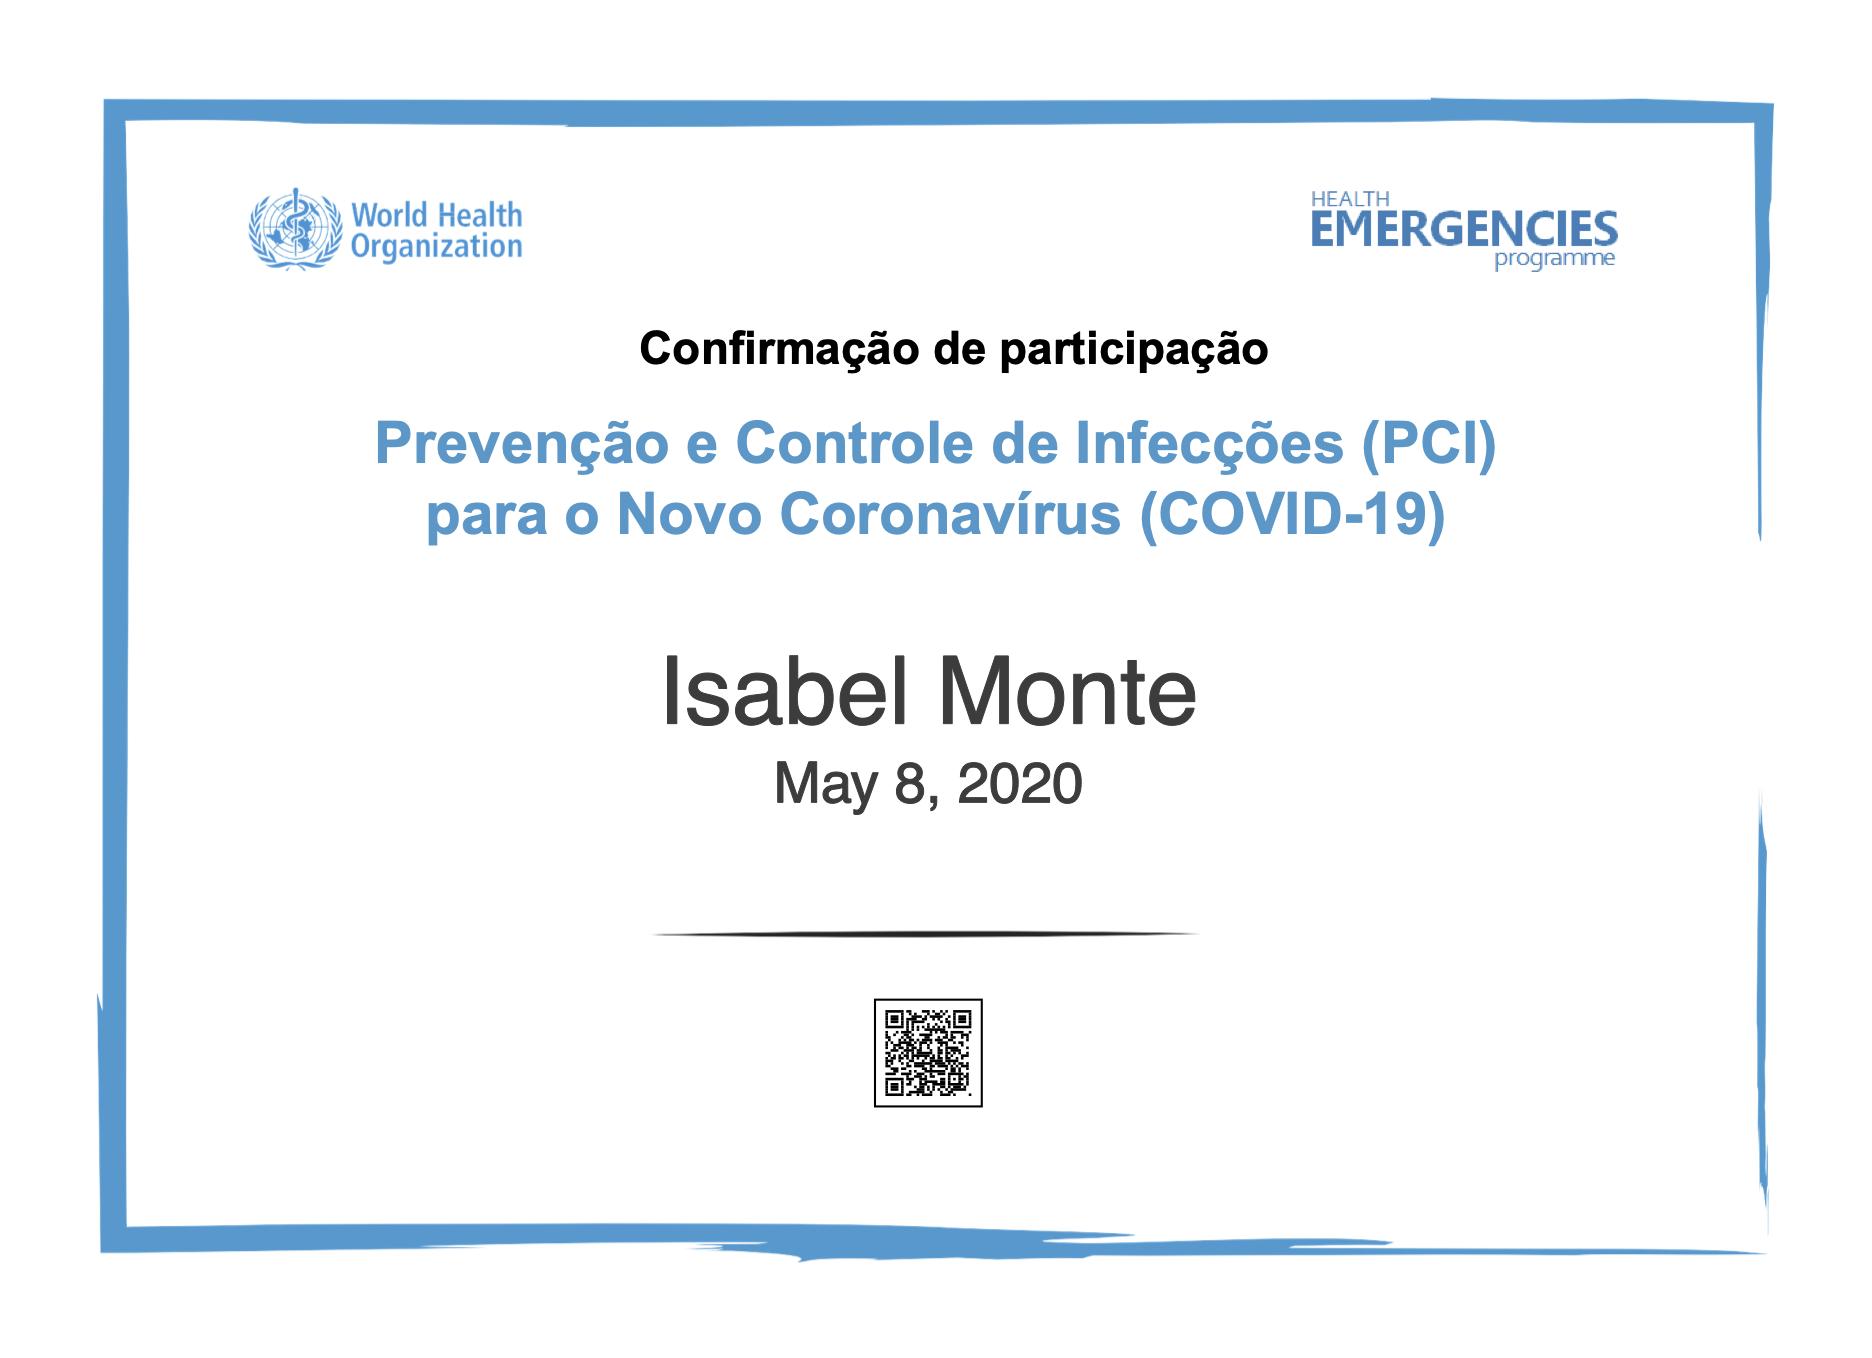 WHO_COVID_19_PCI_PT_Confirmation_Participation